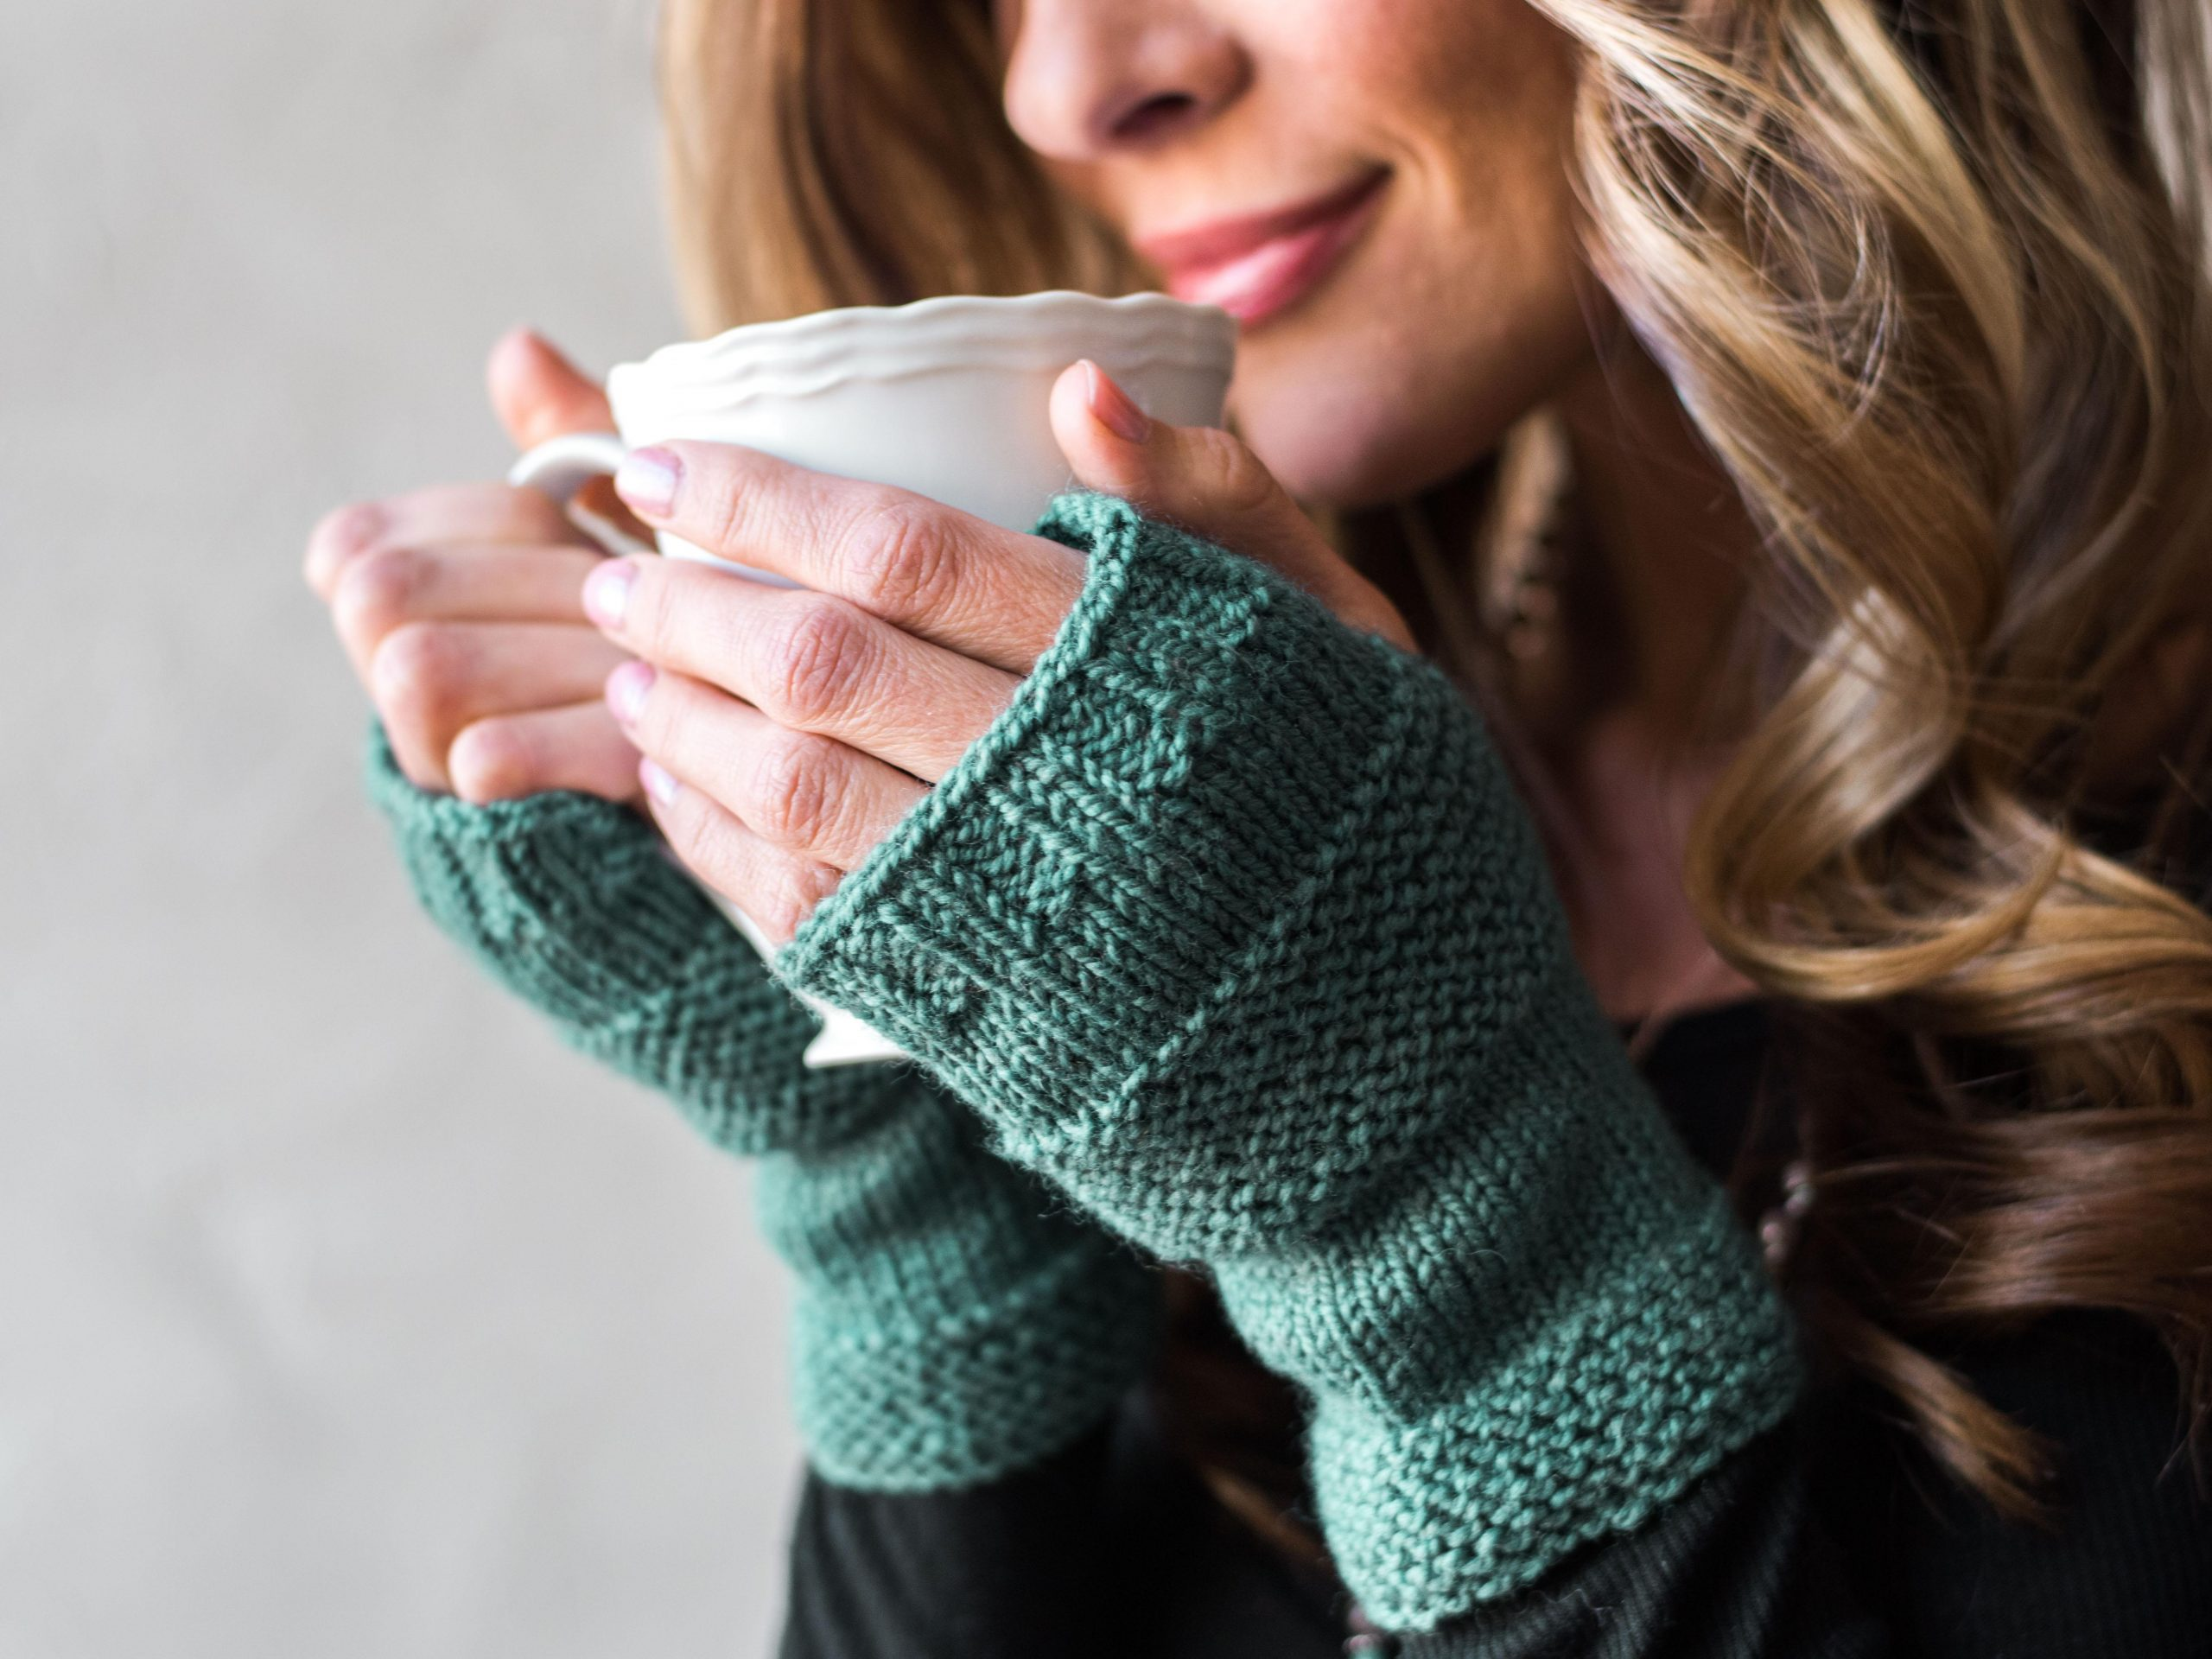 Woman wearing green fingerless gloves